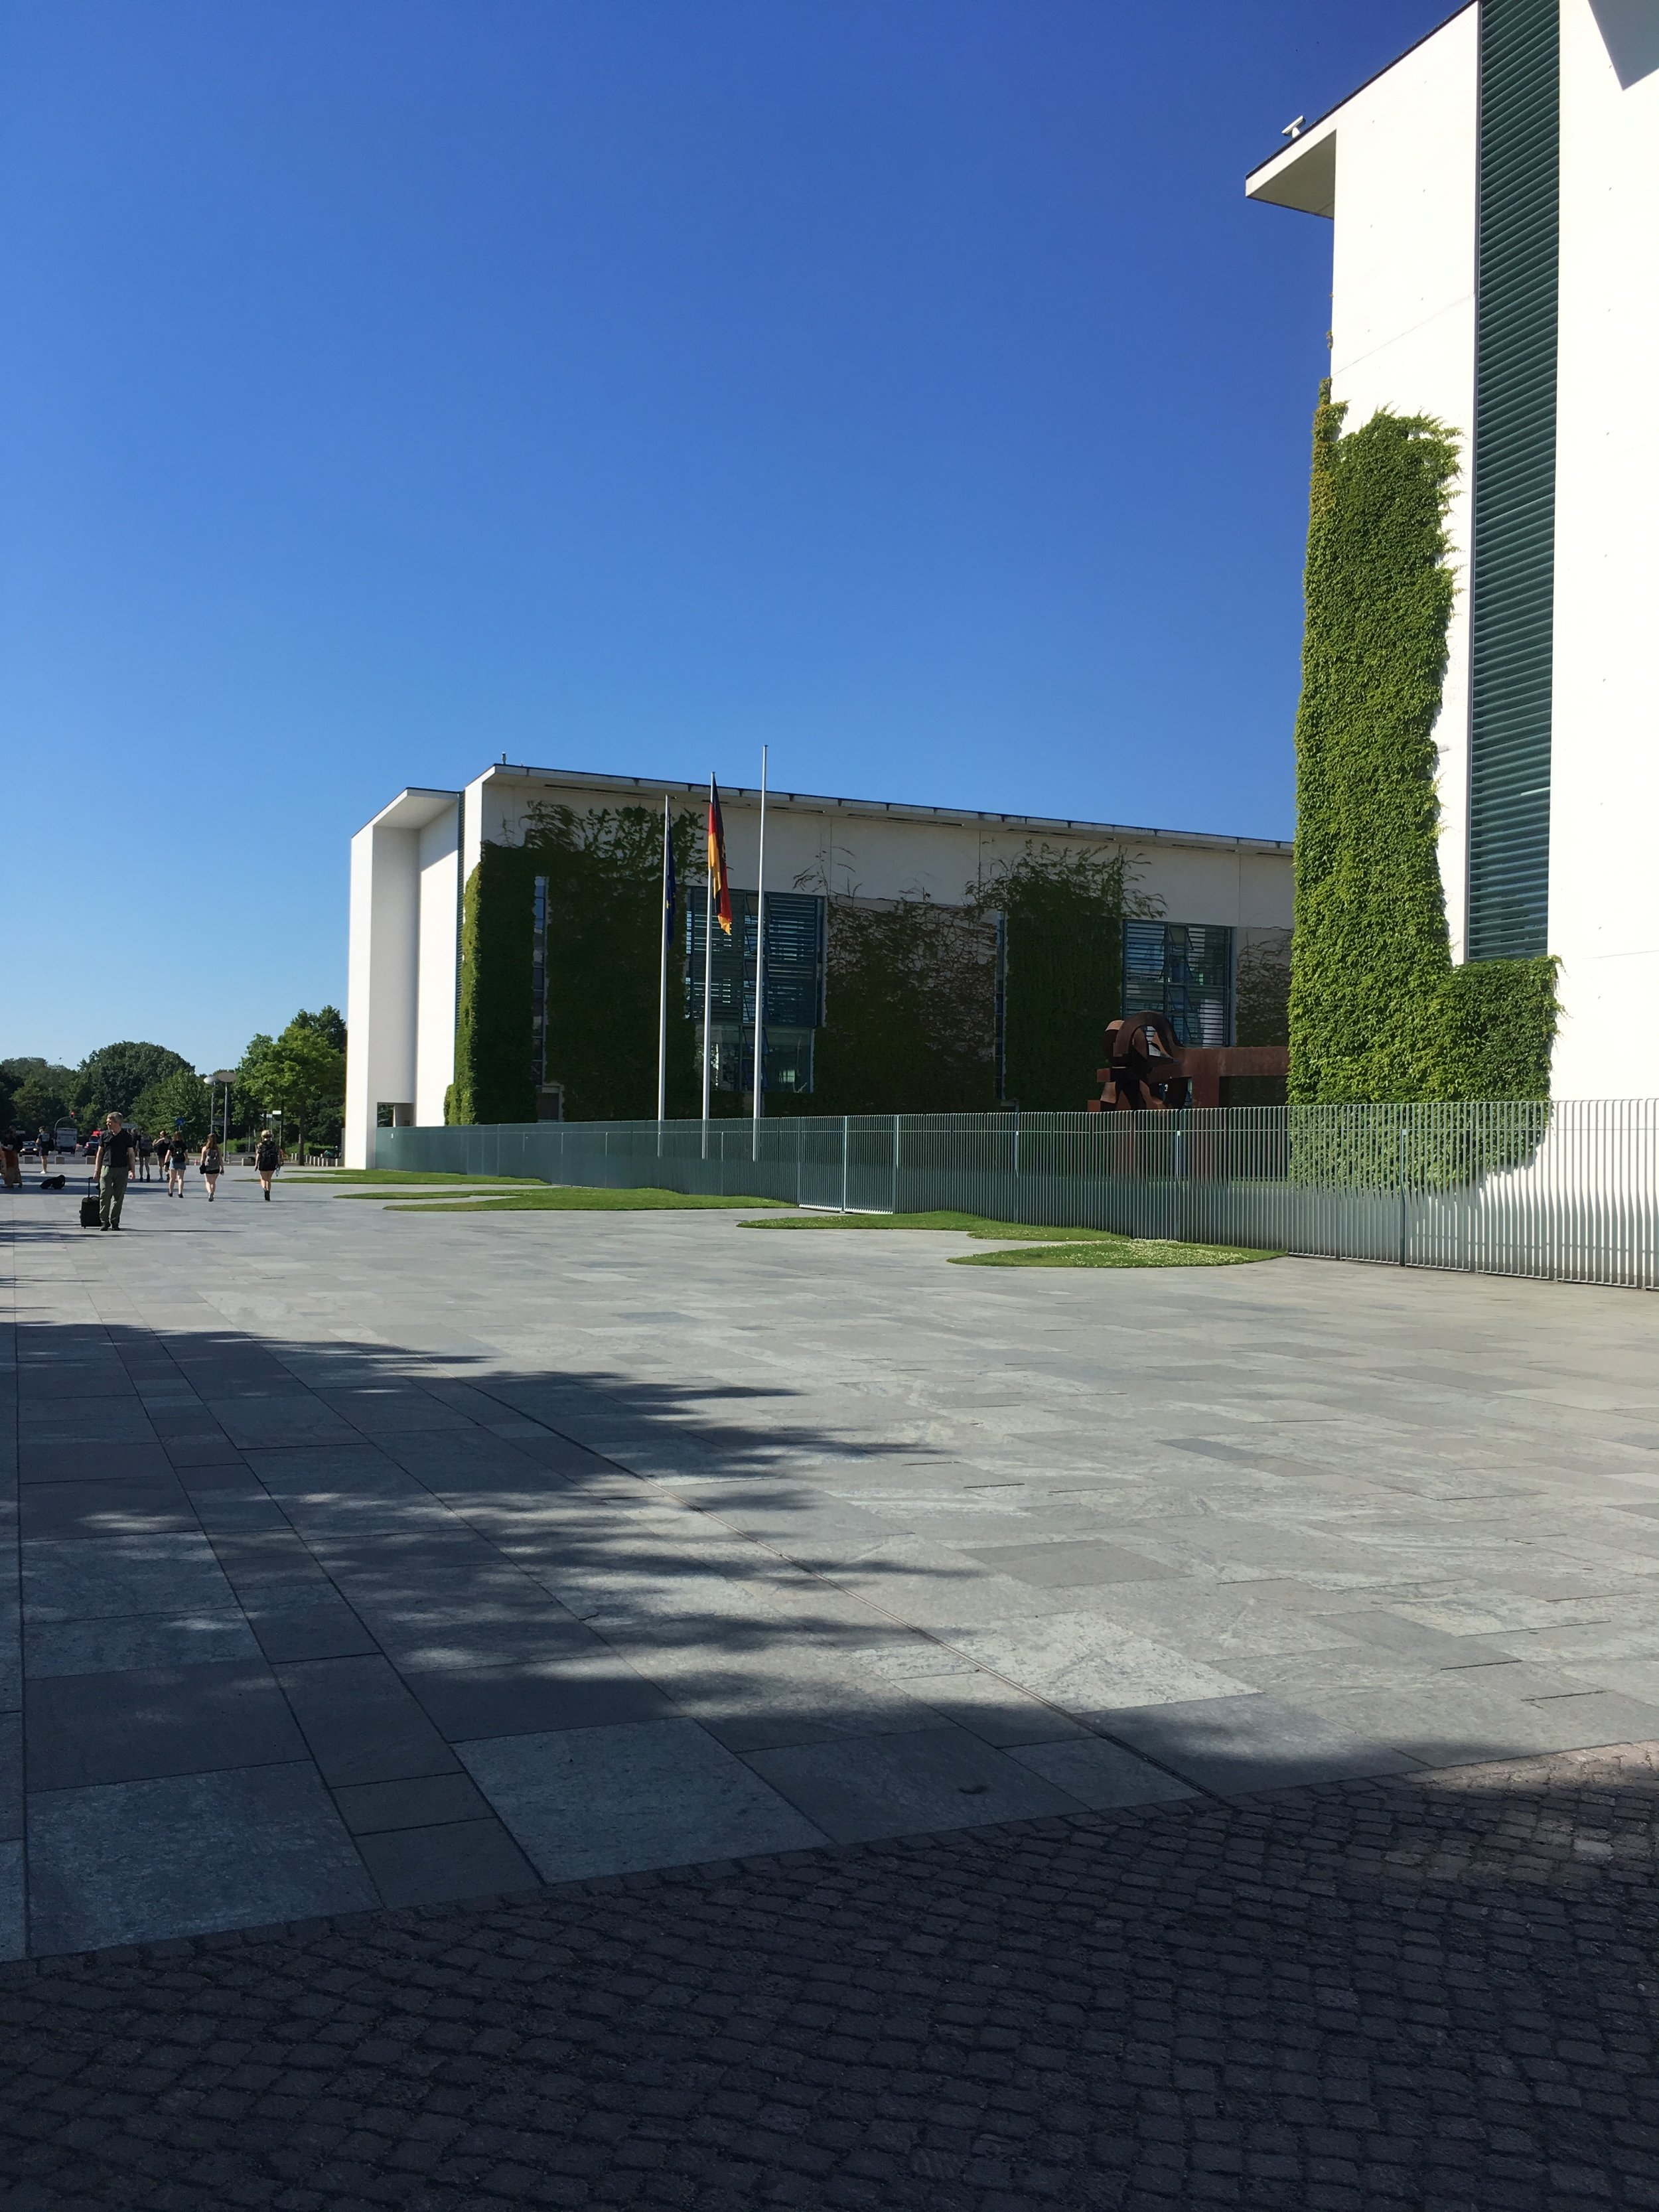 Ankunft am Bundeskanzleramt in Berlin